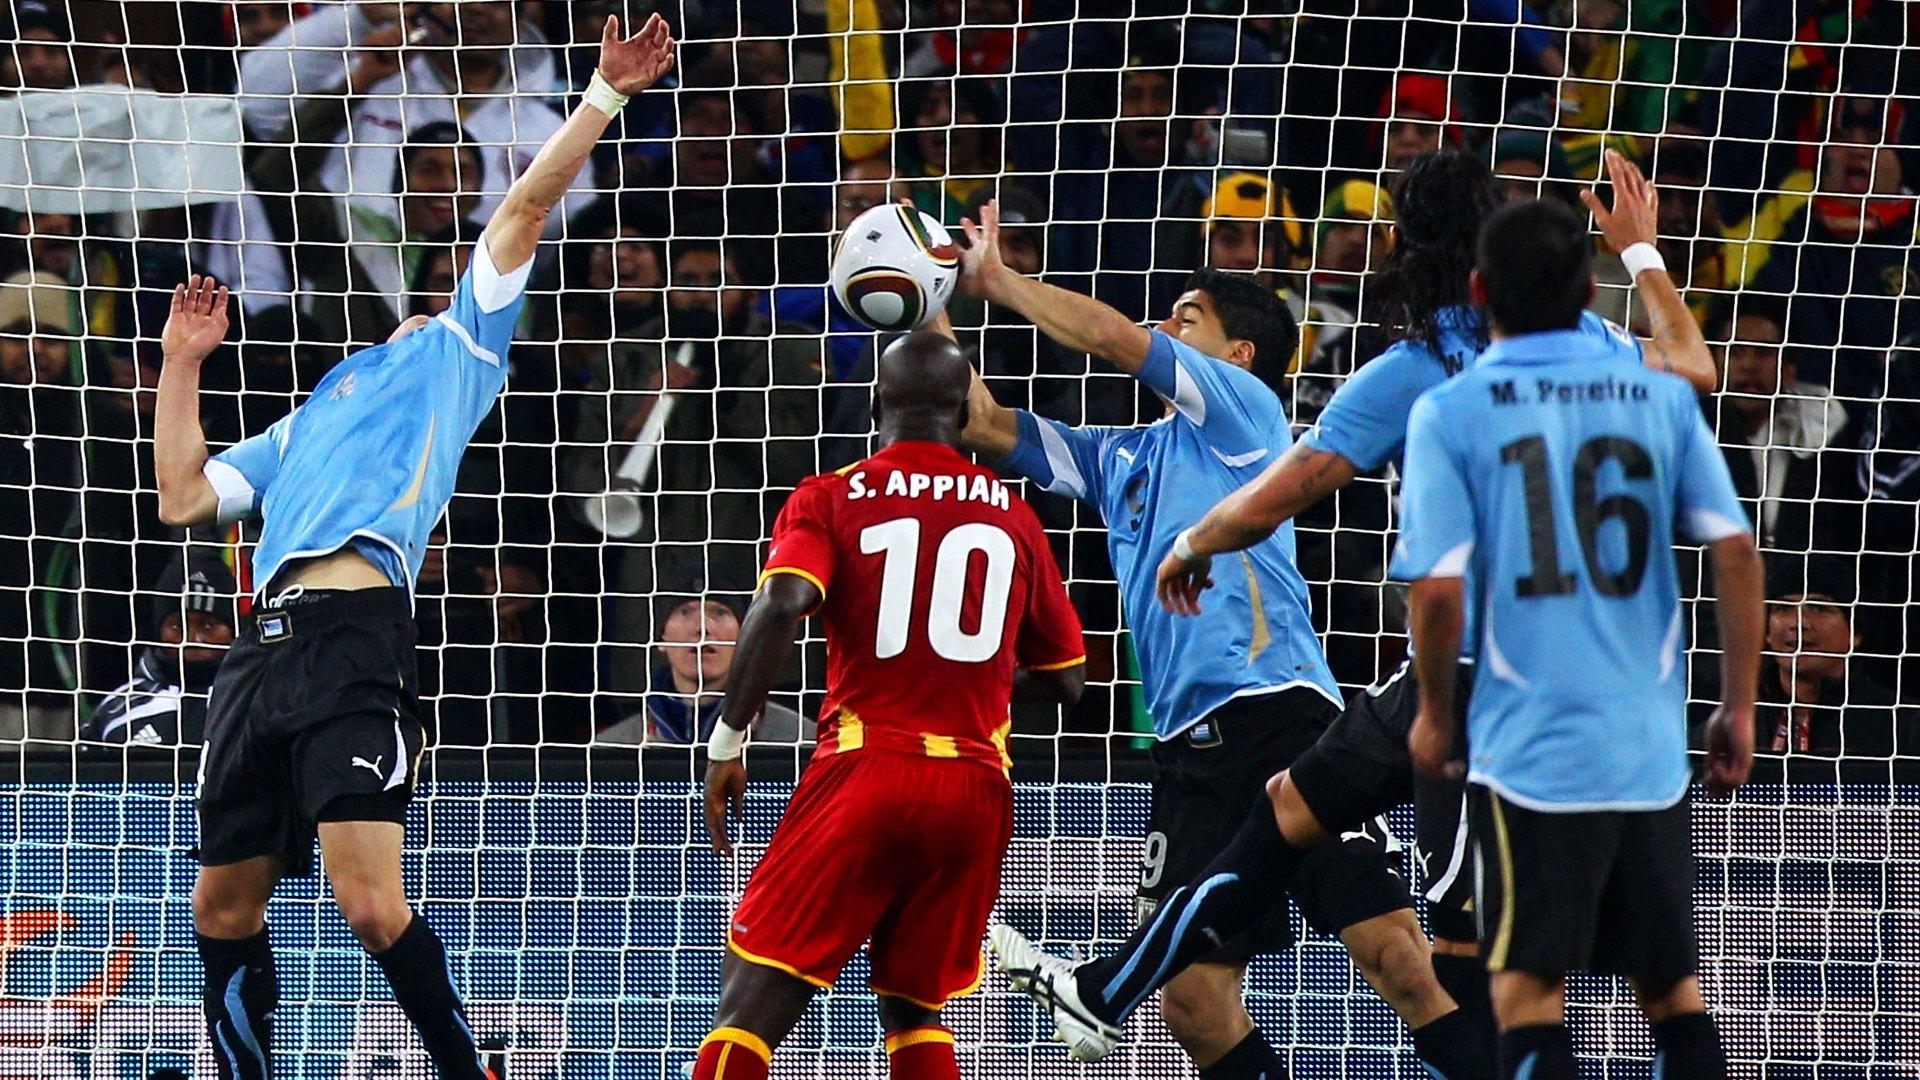 'How can I forgive him?' – Ex-Ghana international Sarpei on Suarez 2010 World Cup handball